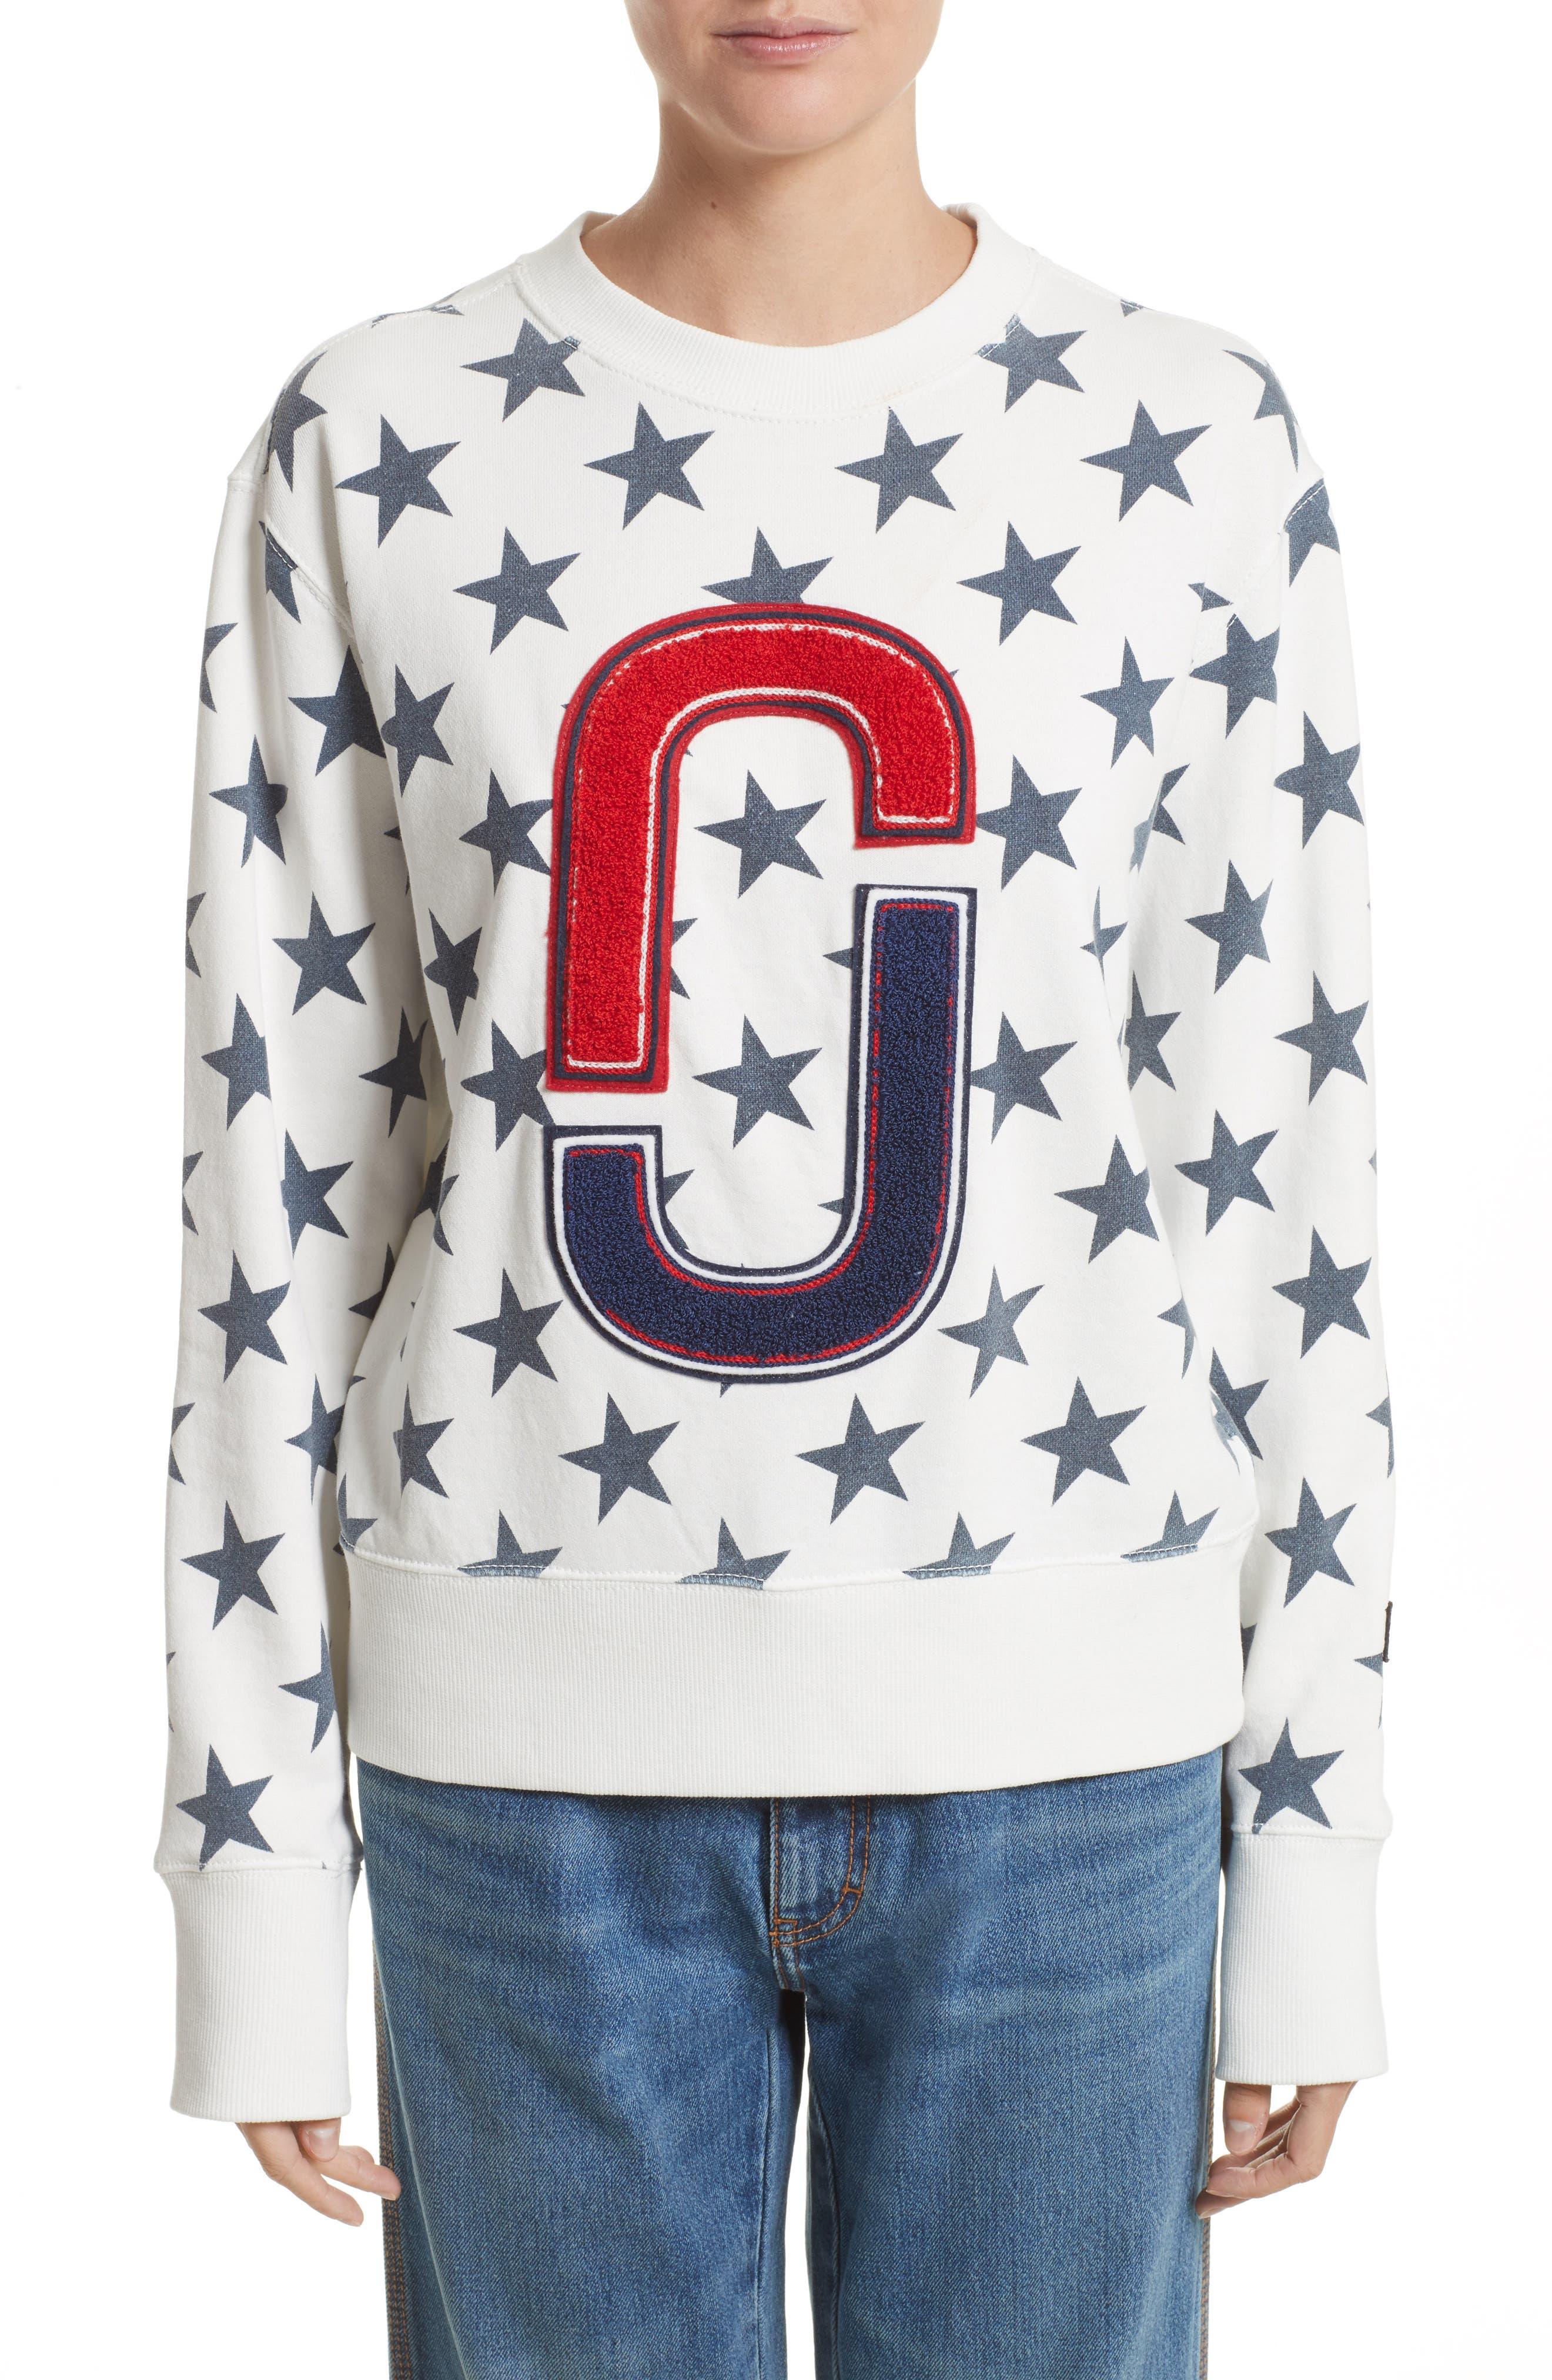 Main Image - MARC JACOBS '90s Star Print Sweatshirt